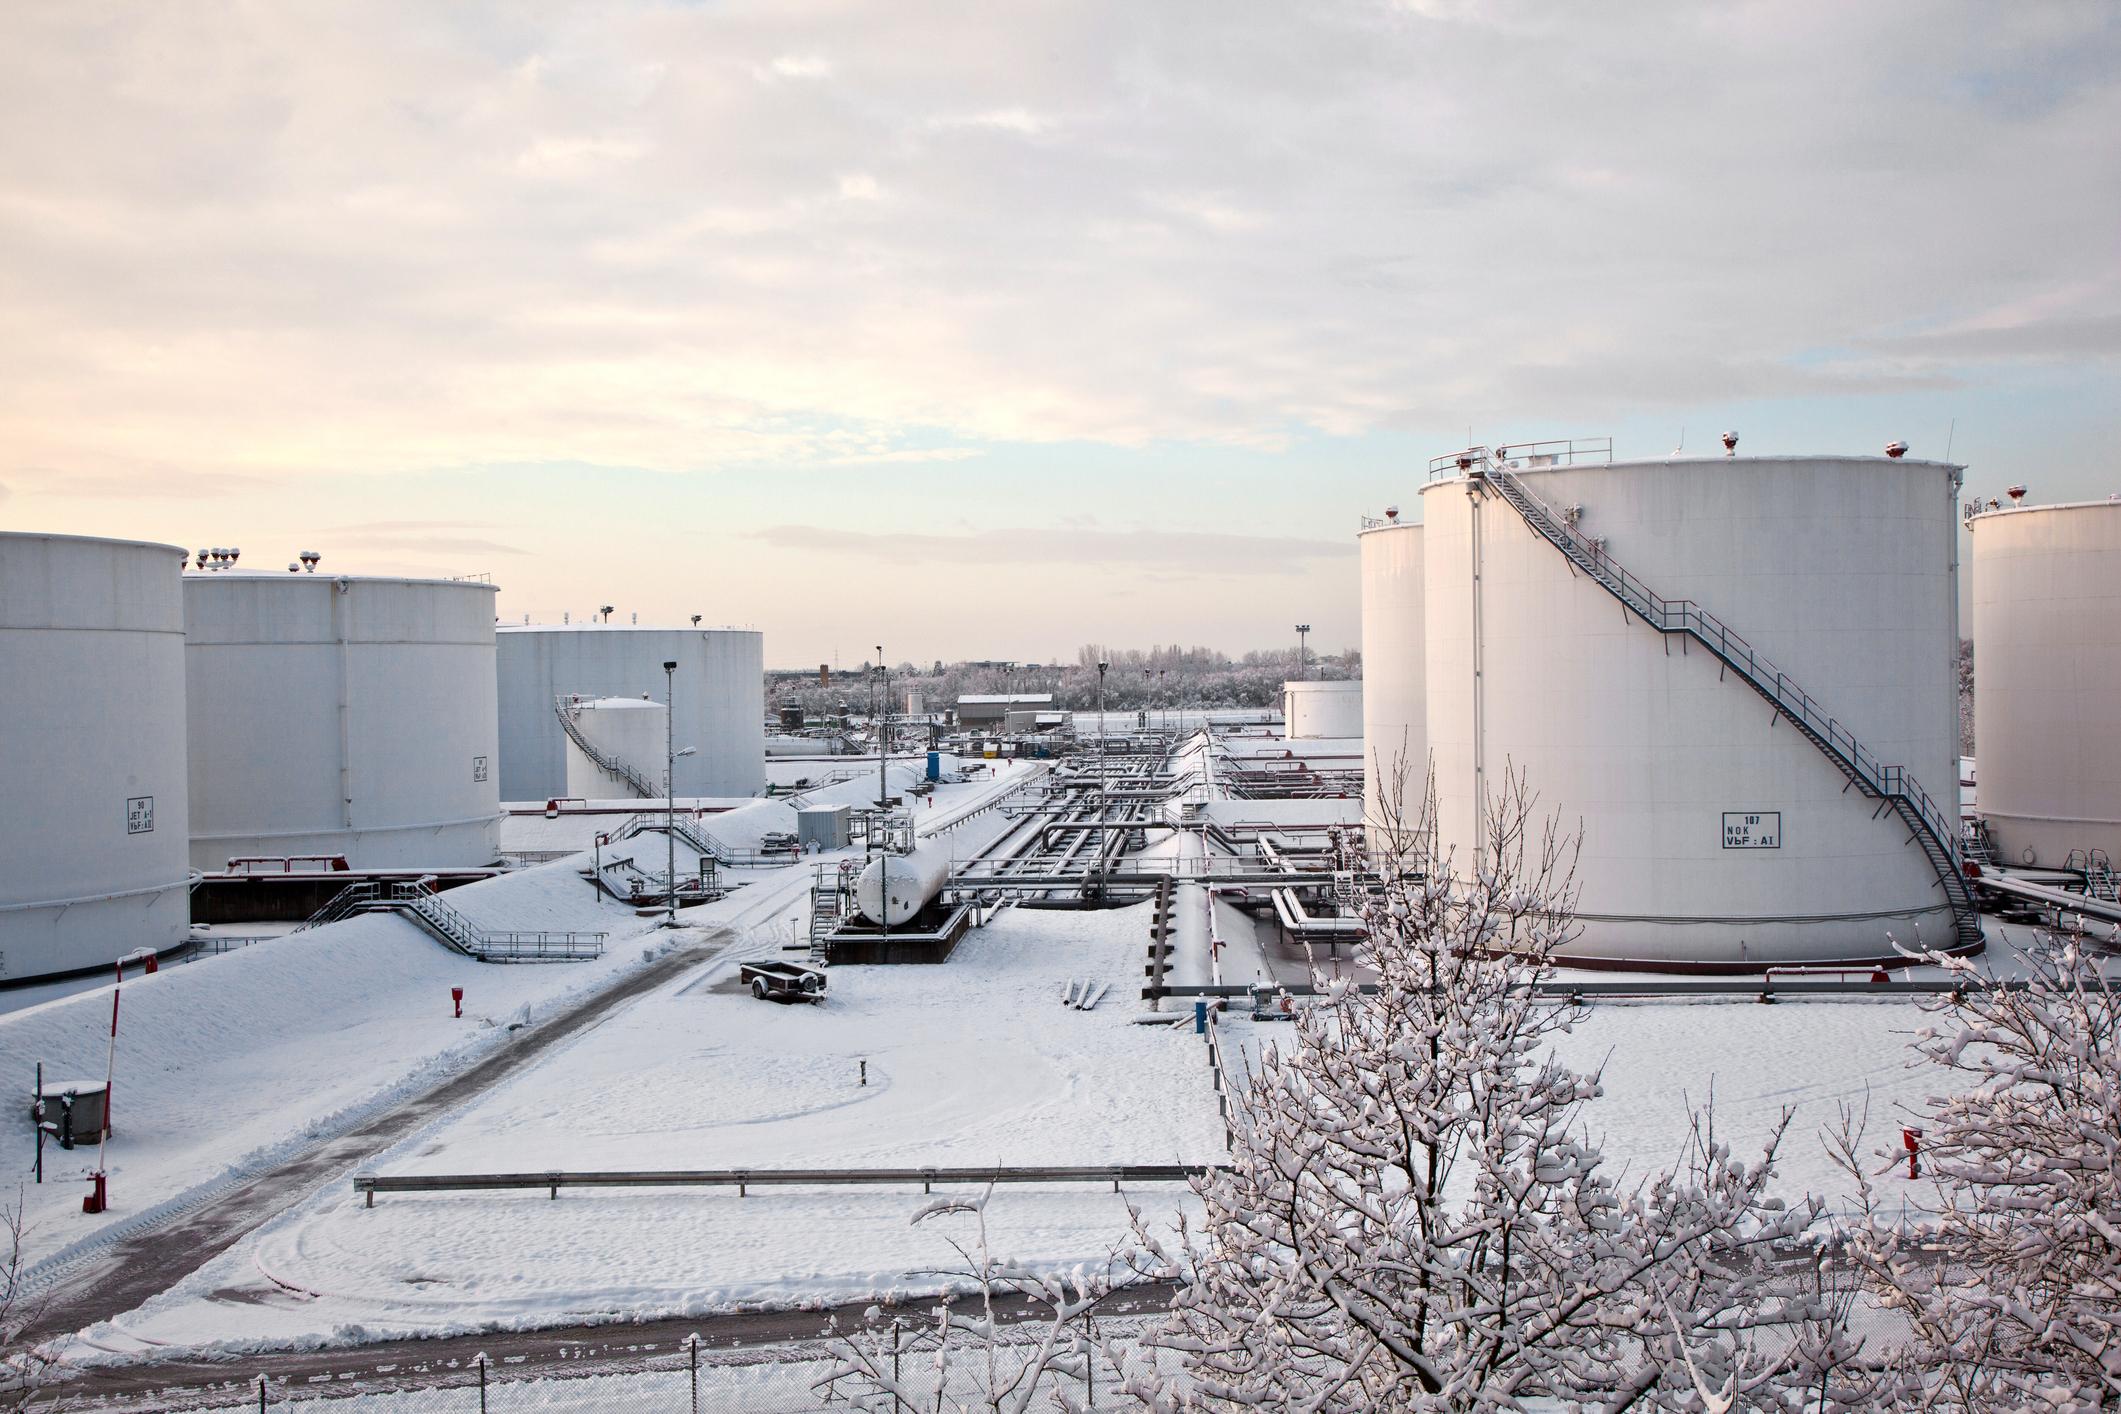 A petroleum storage tank farm with snow.